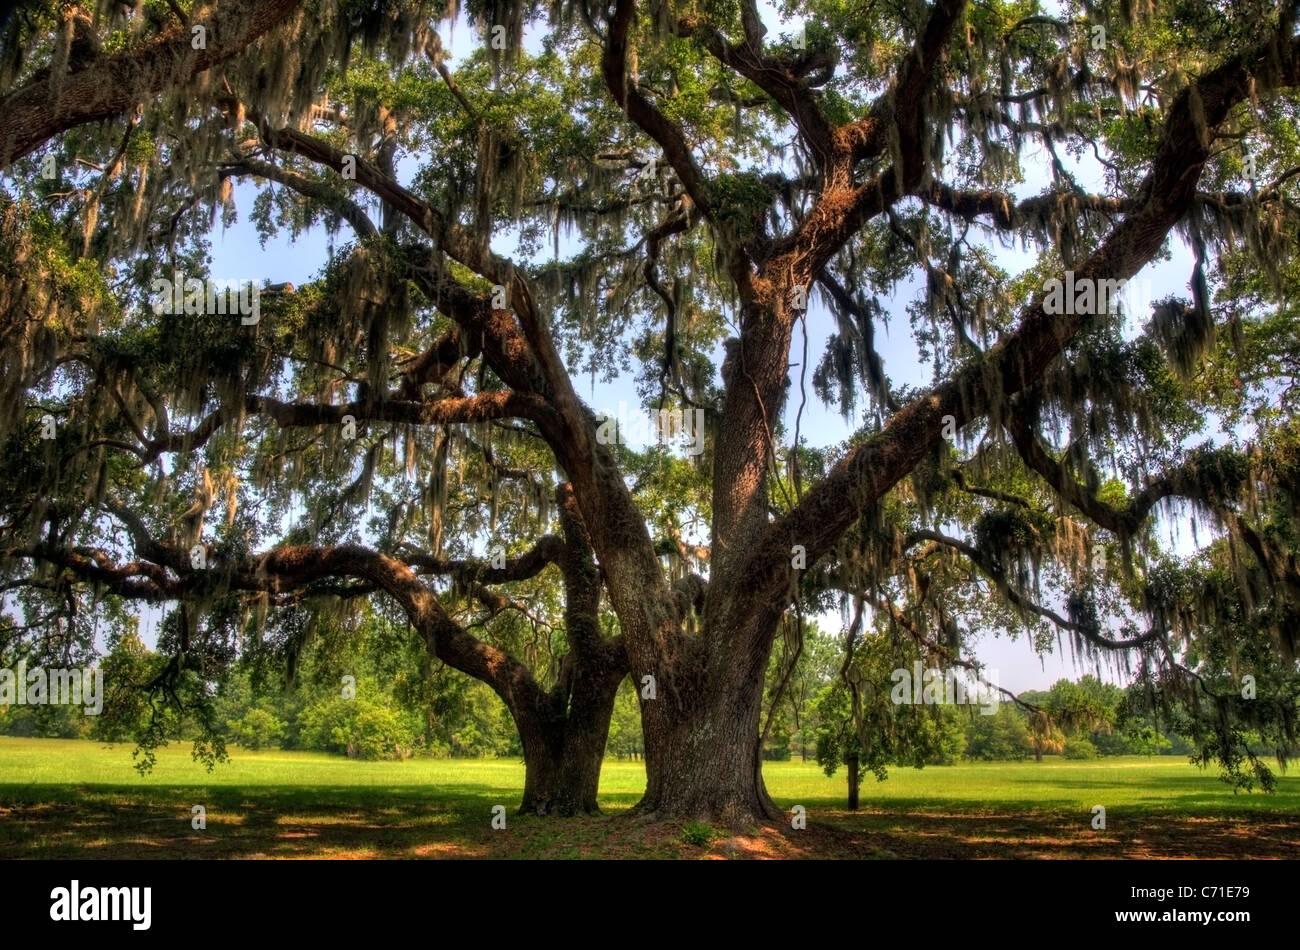 Riesige Eiche Bäume im Honig Horn Plantage auf Hilton Head Island, South Carolina. Stockbild